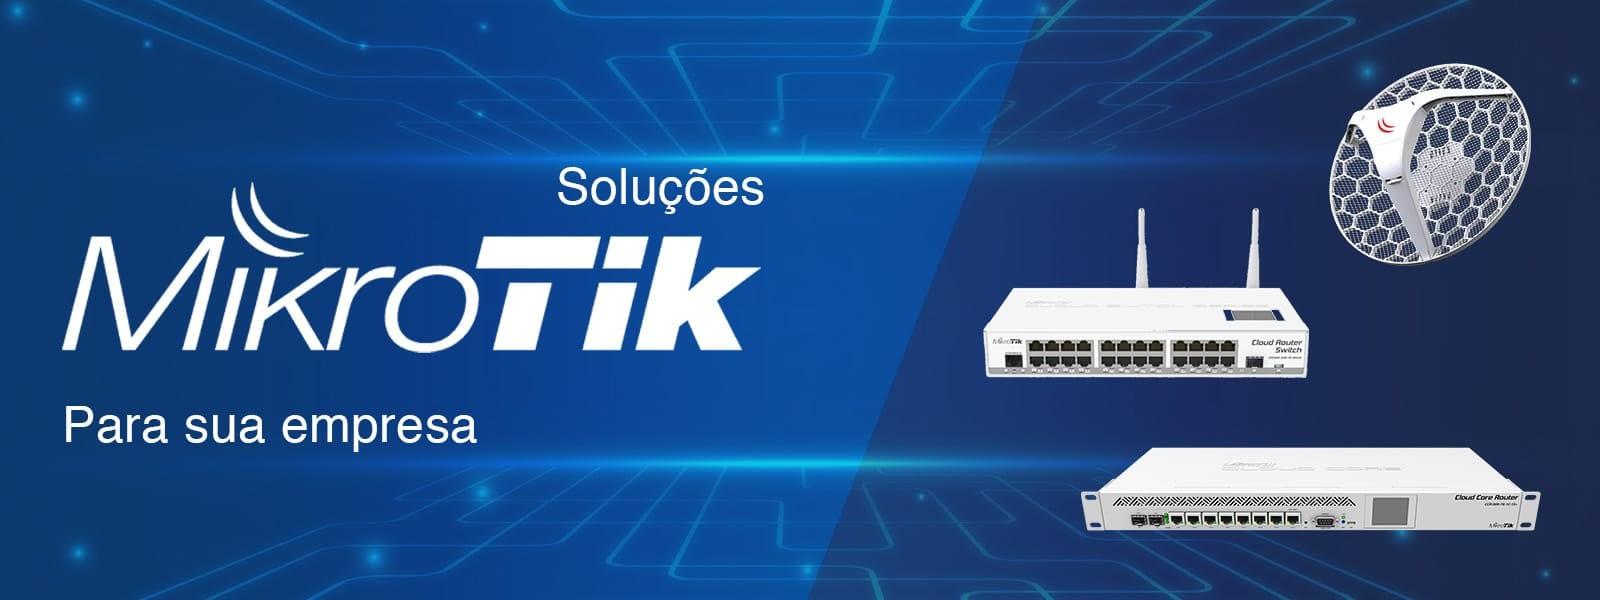 Banner Soluções Mikrotik